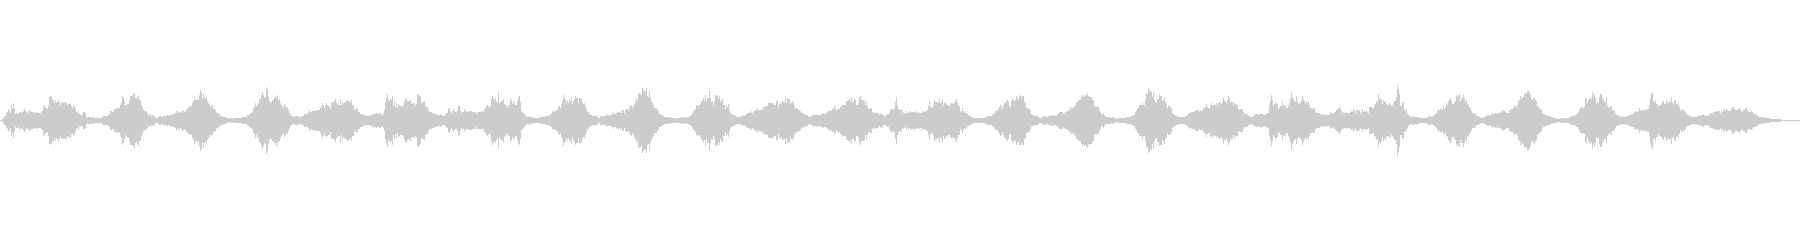 SE/冬/キラキラ/銀世界/ロングVarの未再生の波形